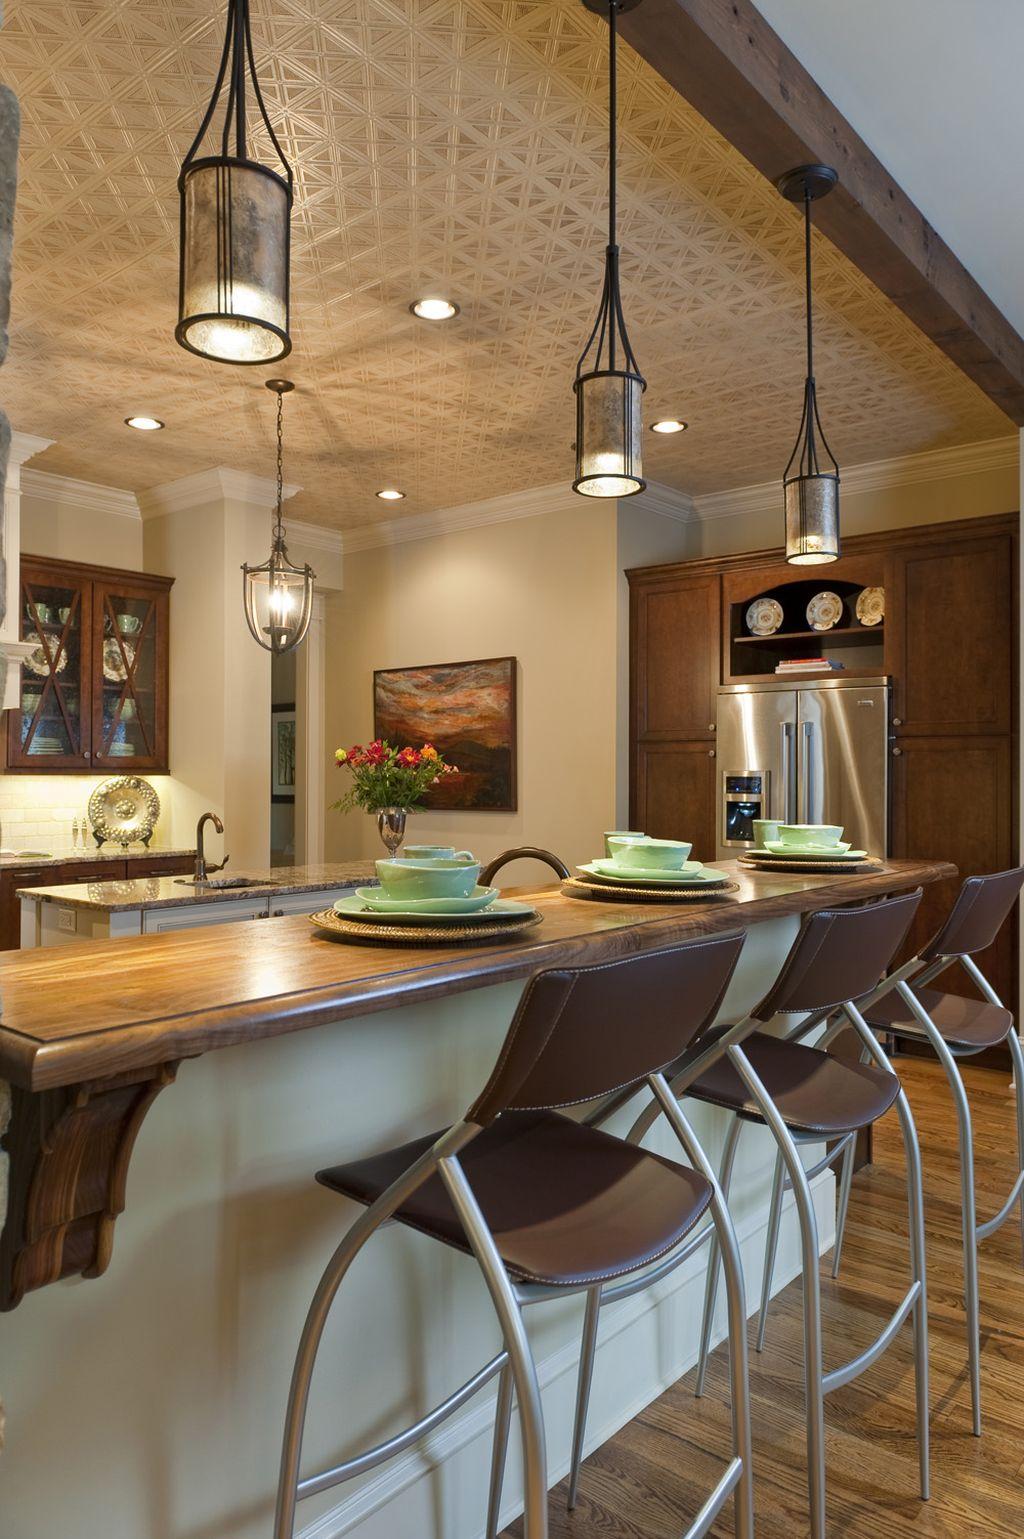 Amazing Mini Pendant Lights Over Kitchen Island - Best lighting for over kitchen island